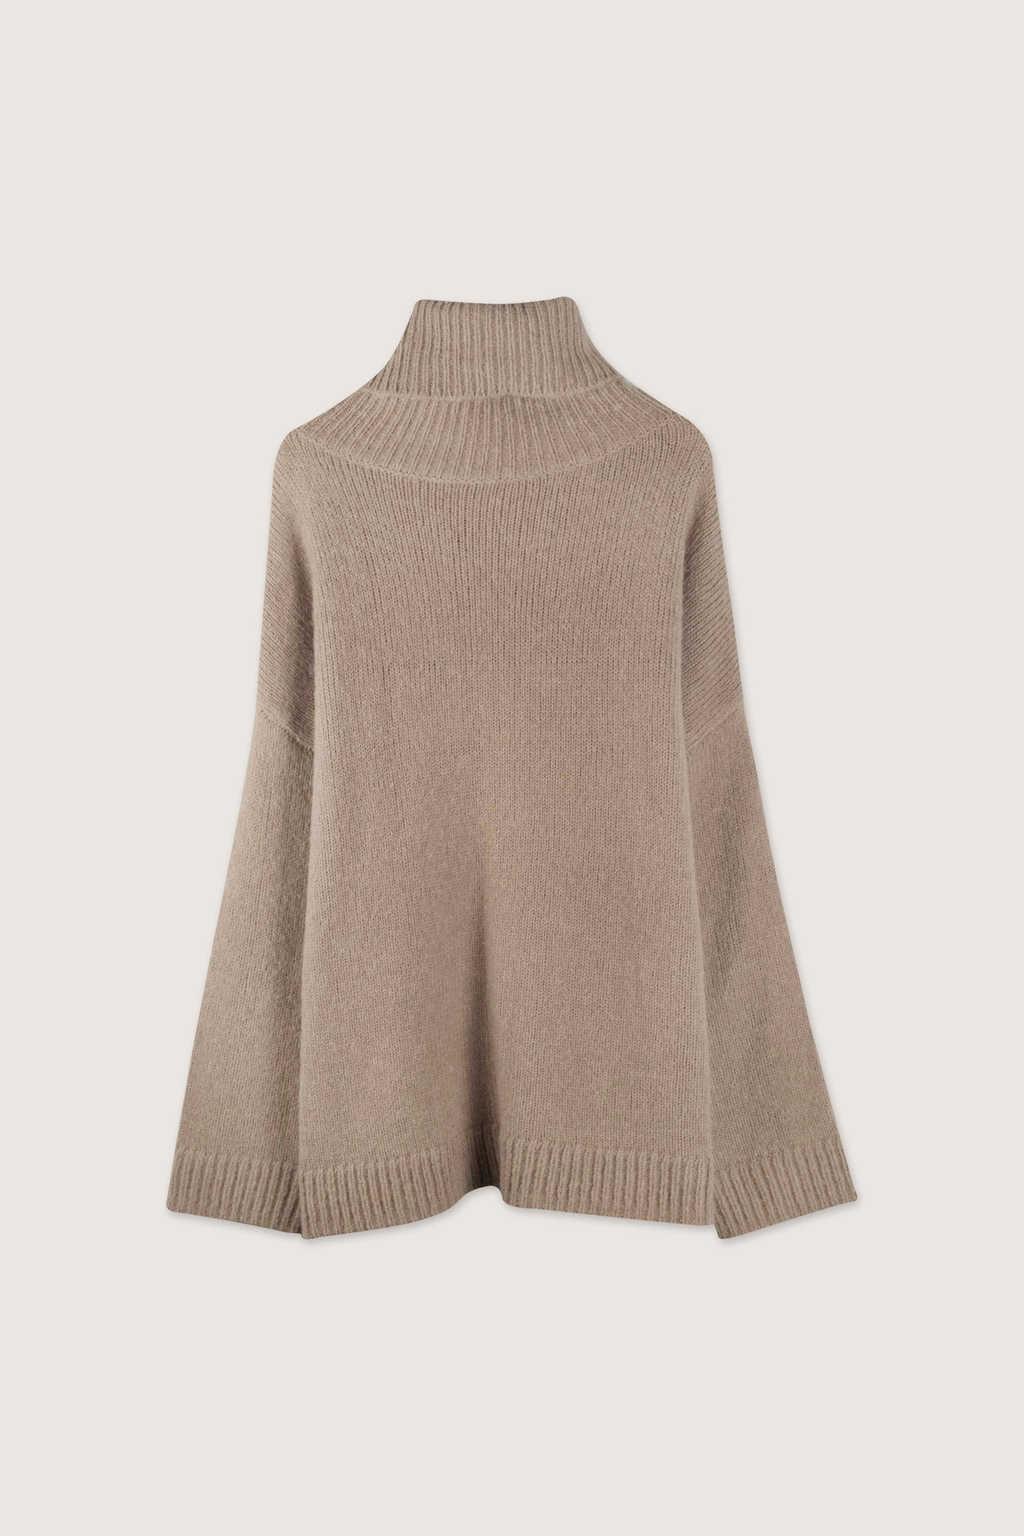 Sweater 1782 Beige 9